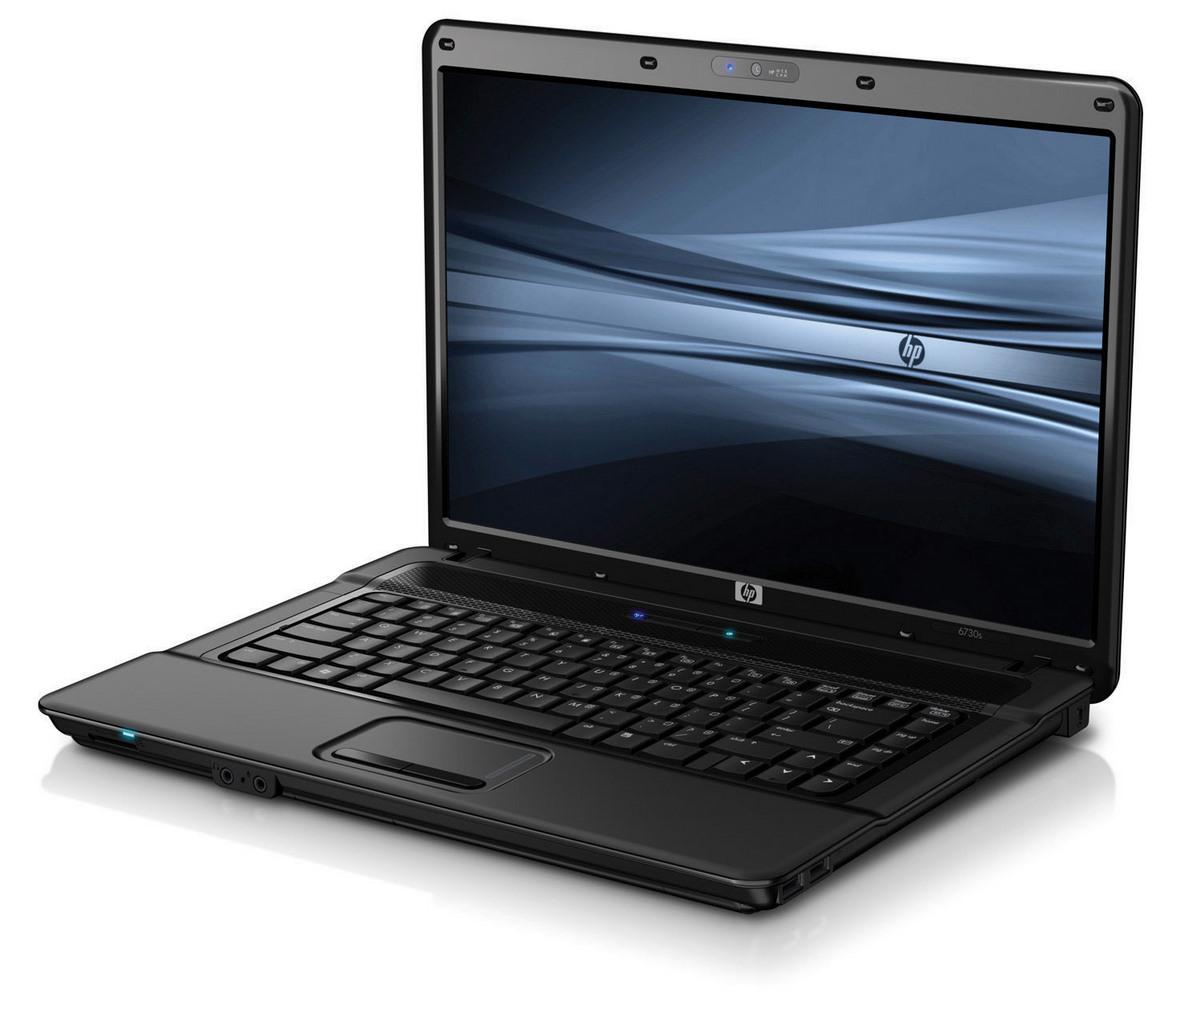 Iphone wallpaper gray - Dell Wallpaer Black Laptop